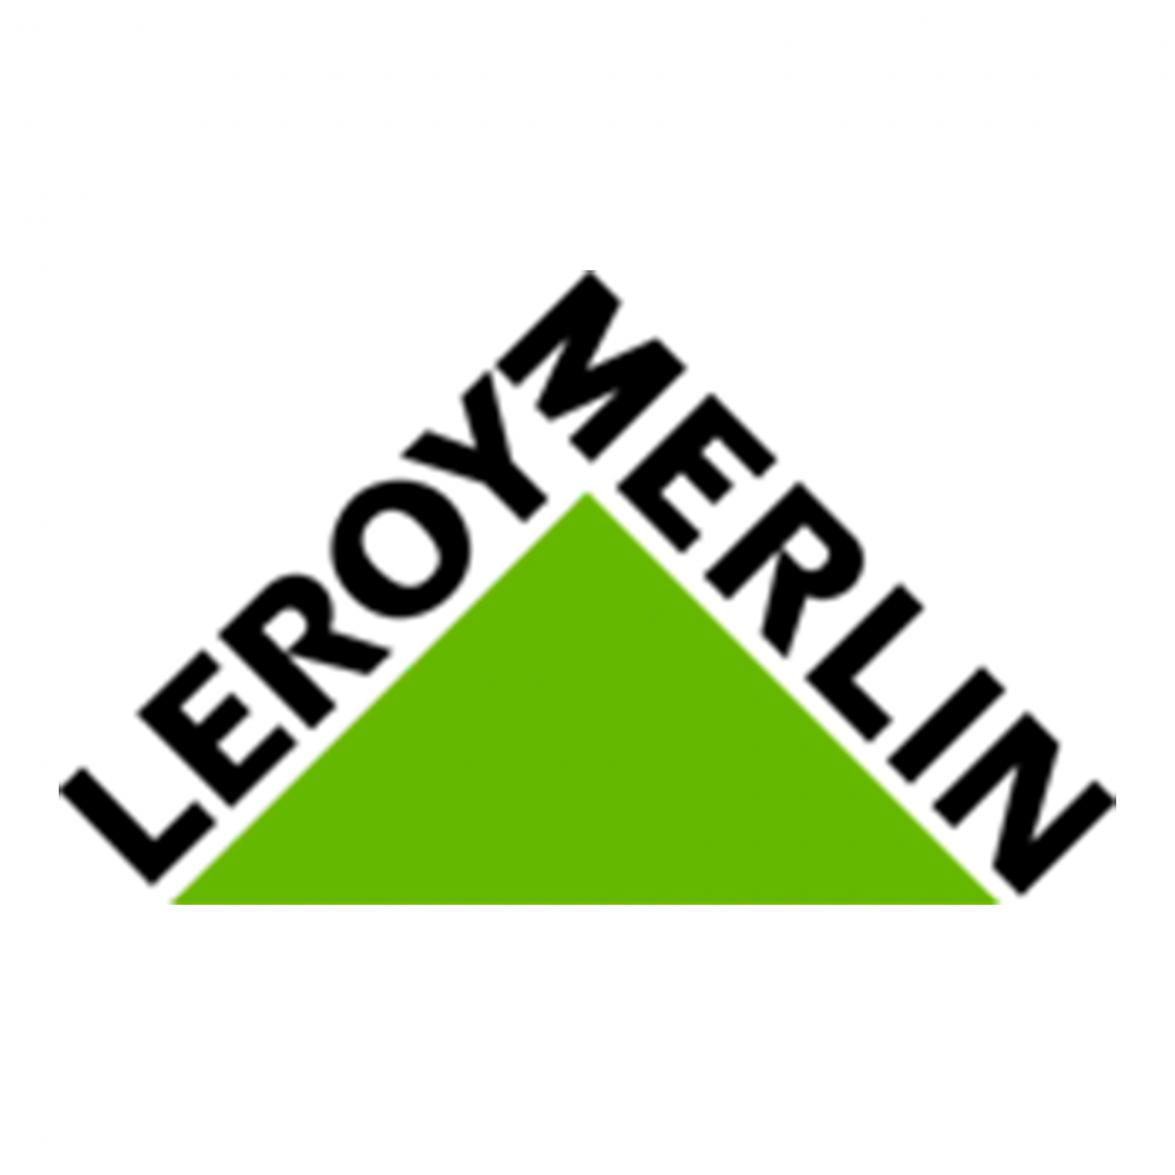 Angèle Von kiss - Mes clients - LEROY MERLIN